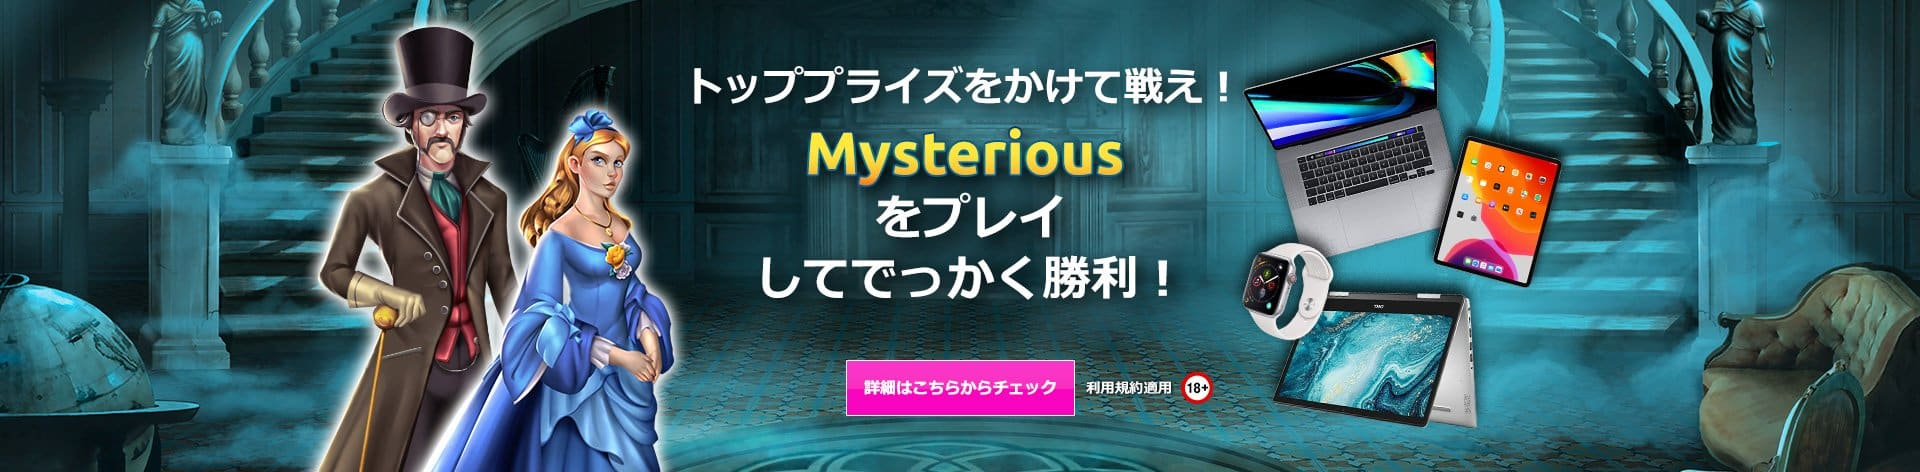 background_mysterious_ja